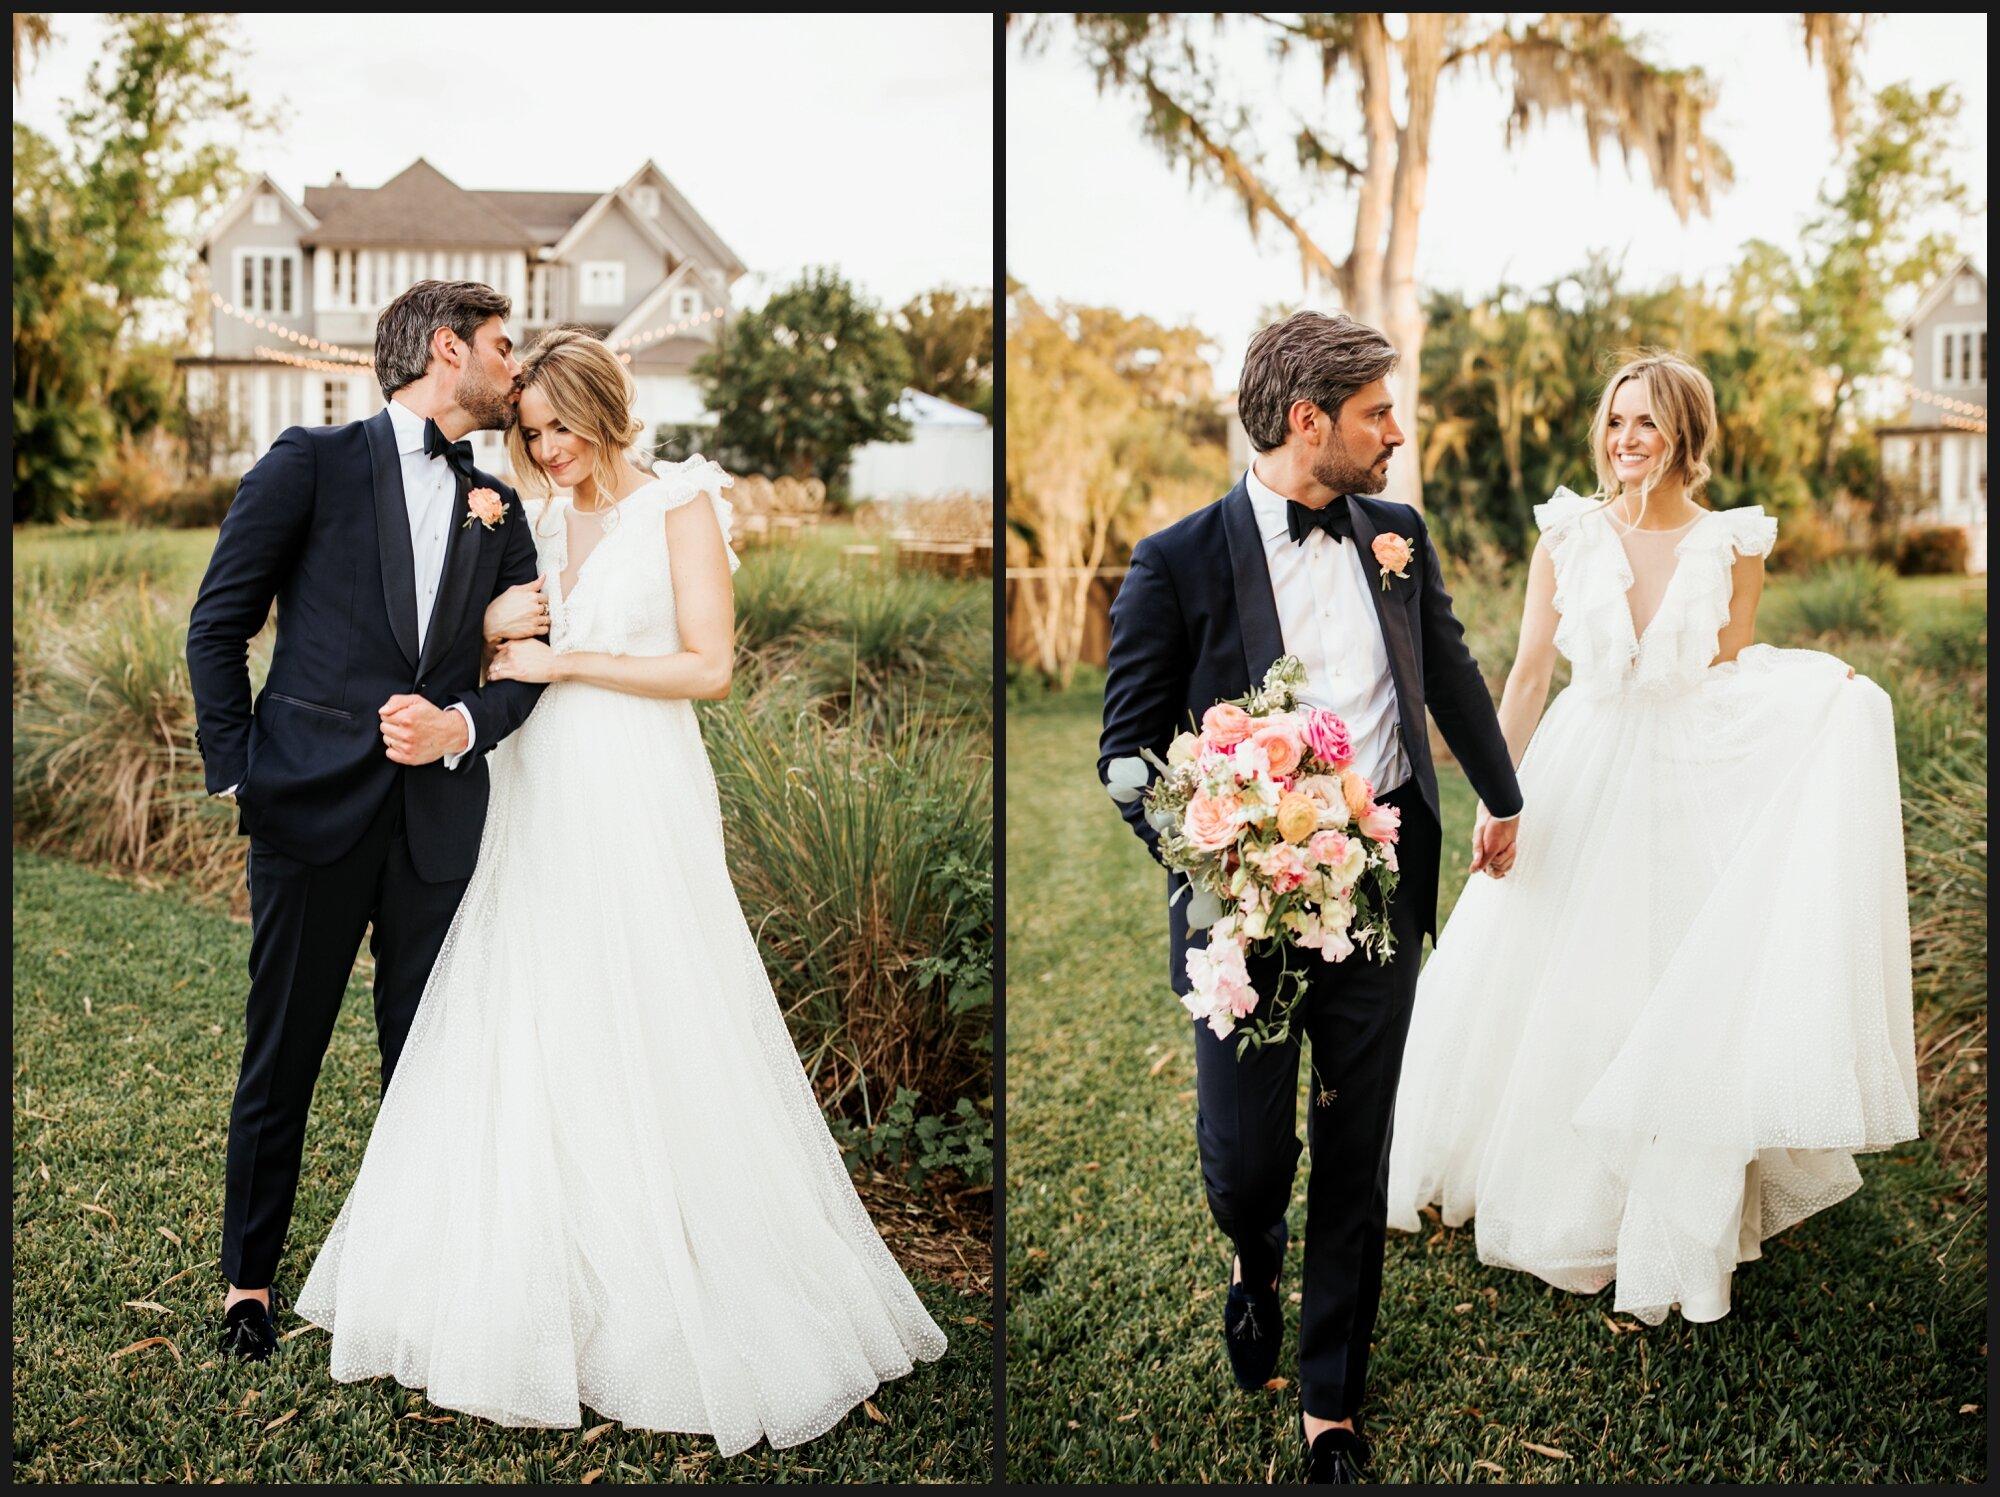 Orlando-Wedding-Photographer-destination-wedding-photographer-florida-wedding-photographer-hawaii-wedding-photographer_0711.jpg